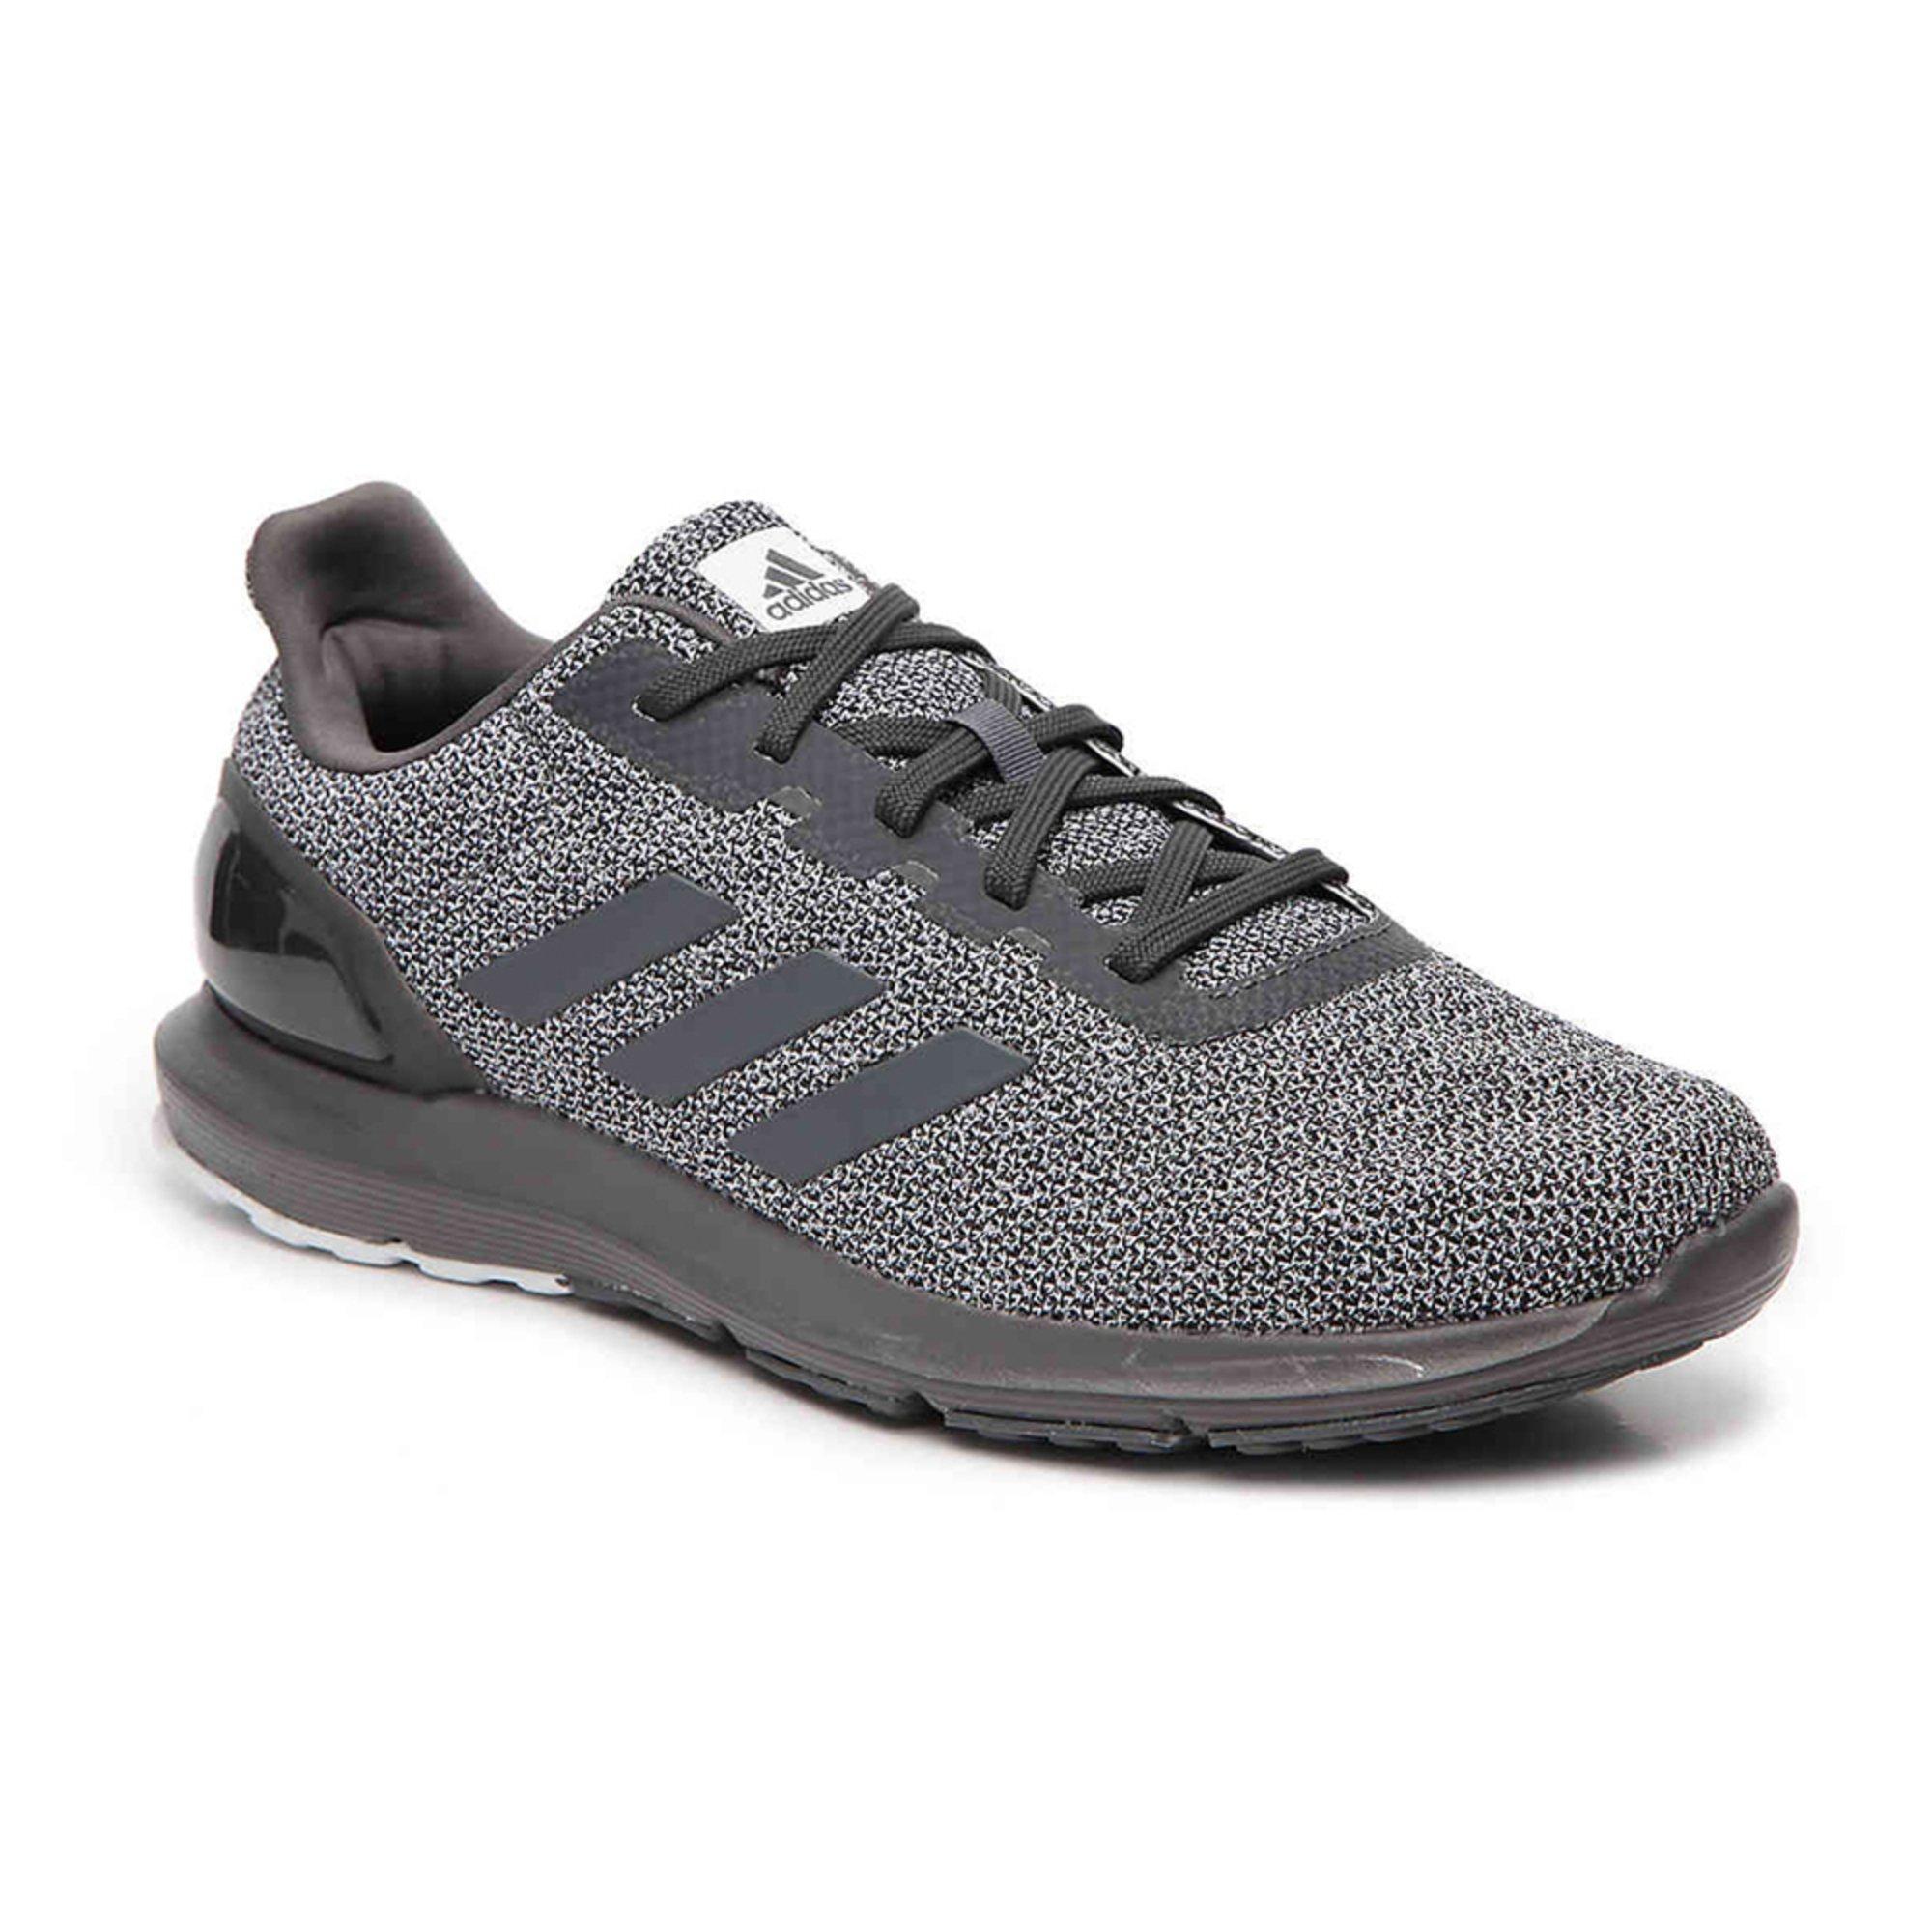 1a47f93cf26 Adidas Men s Cosmic 2 Sl Running Shoe